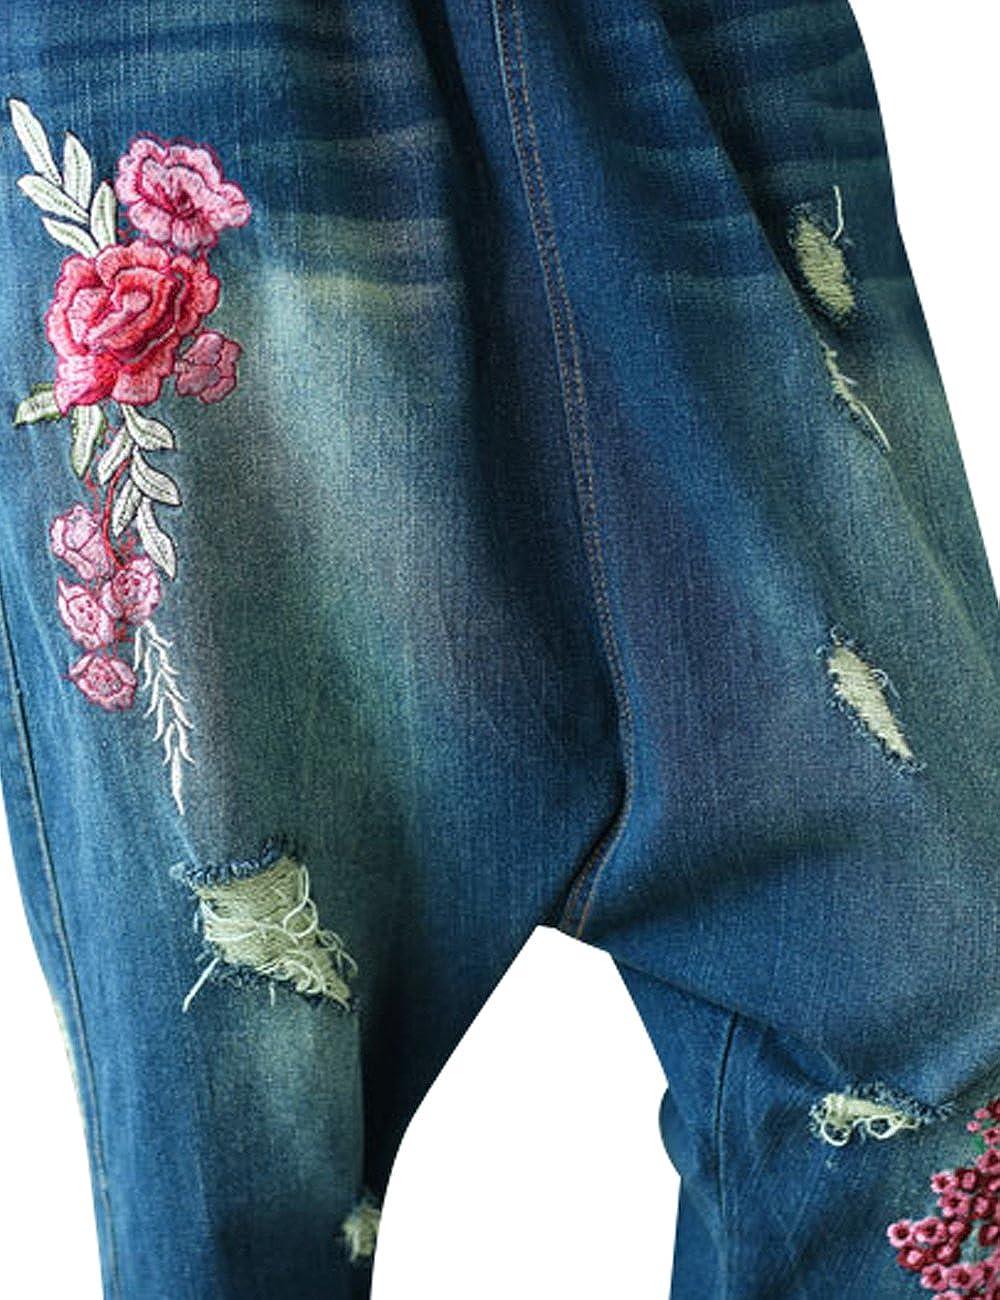 Youlee Donna Estate Patchwork Harem Pantaloni Distrutto Jeans Pantaloni a Gamba Larga